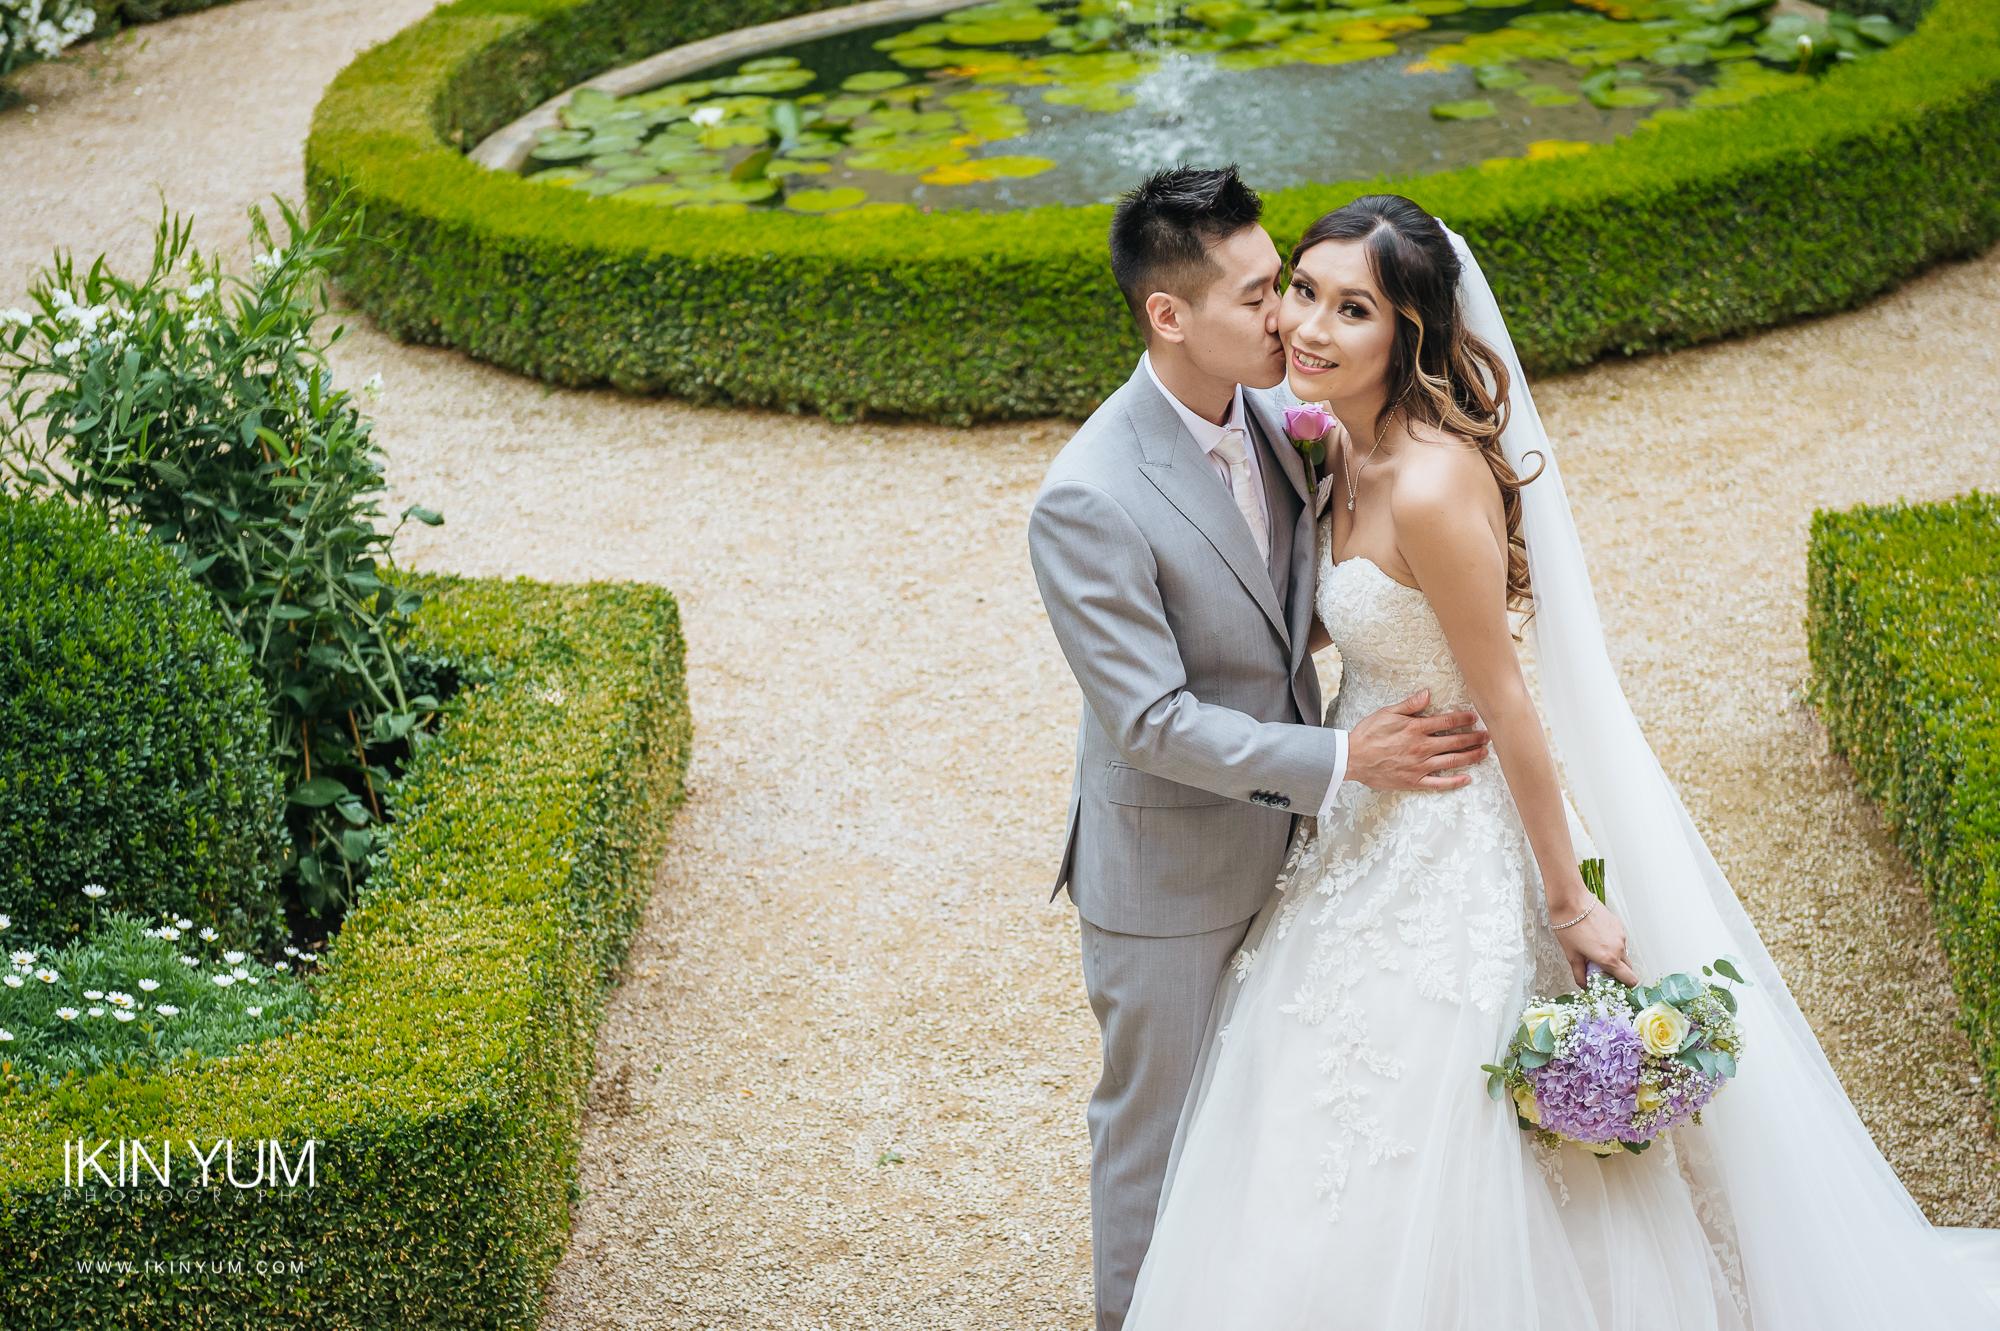 Syon Park Wedding - Ikin Yum Photography -074.jpg